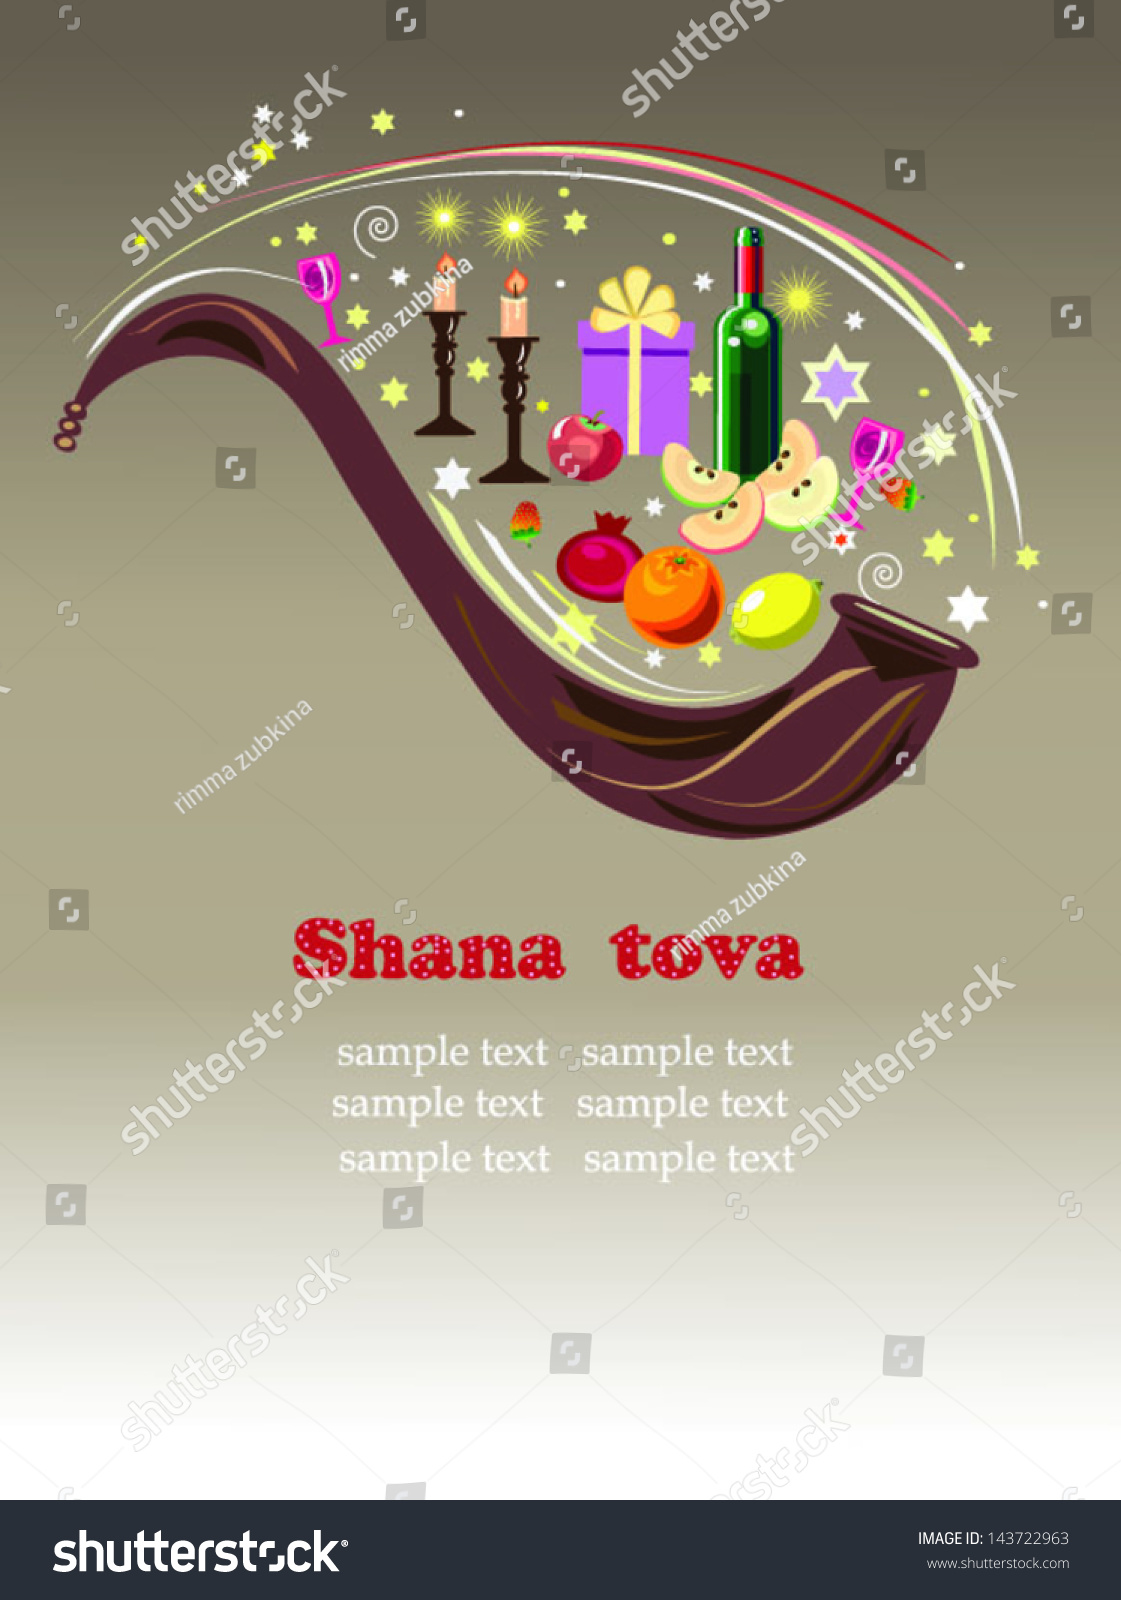 Shana tovajewish new year horn plentyholiday stock vector 143722963 shana tovajewish new year horn of plentyholiday greeting card m4hsunfo